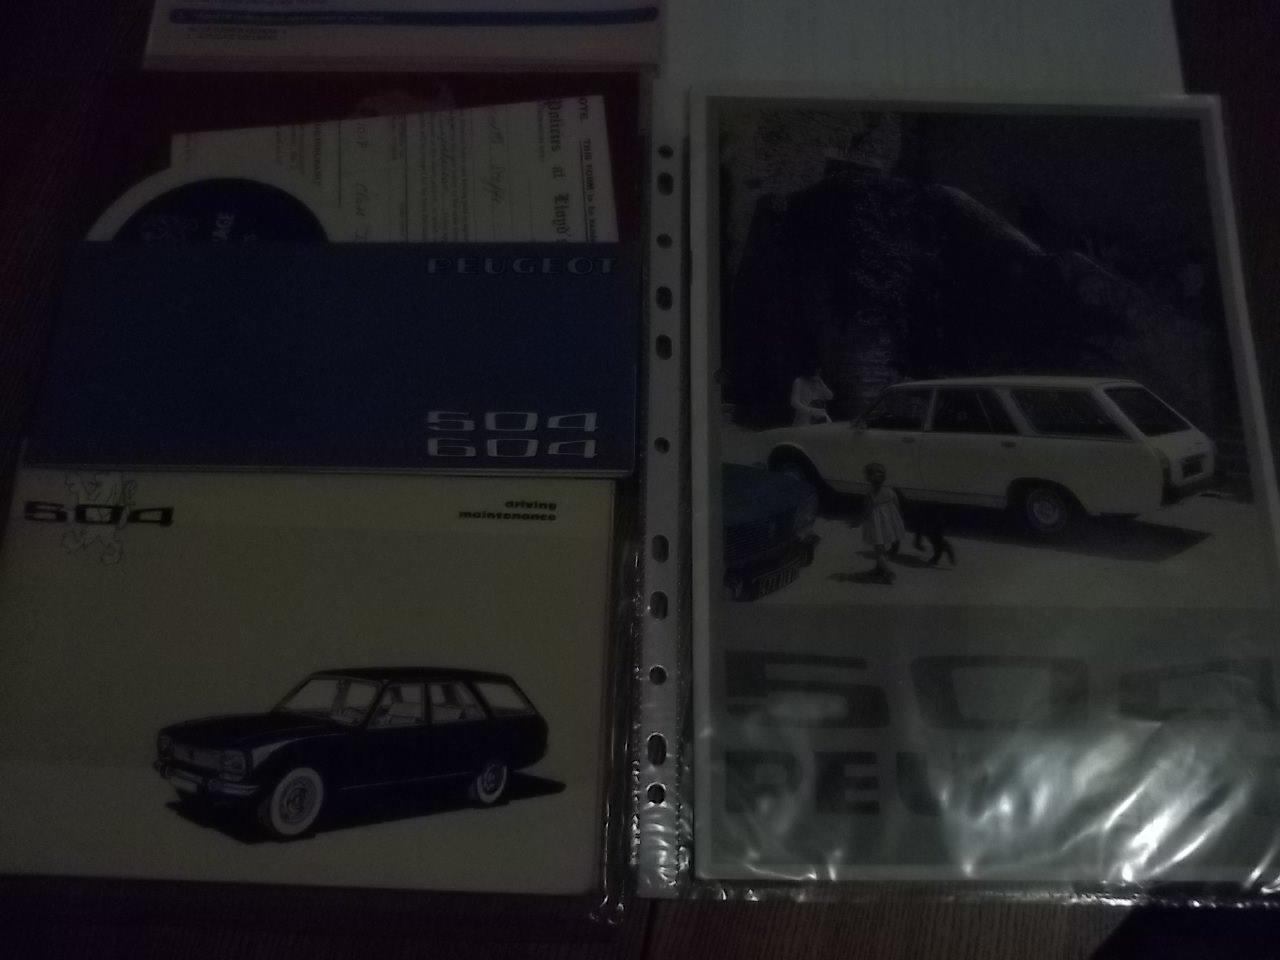 1976 Peugeot 504 2.0 Family Supplying Dealer + 1 owner SOLD (picture 6 of 6)